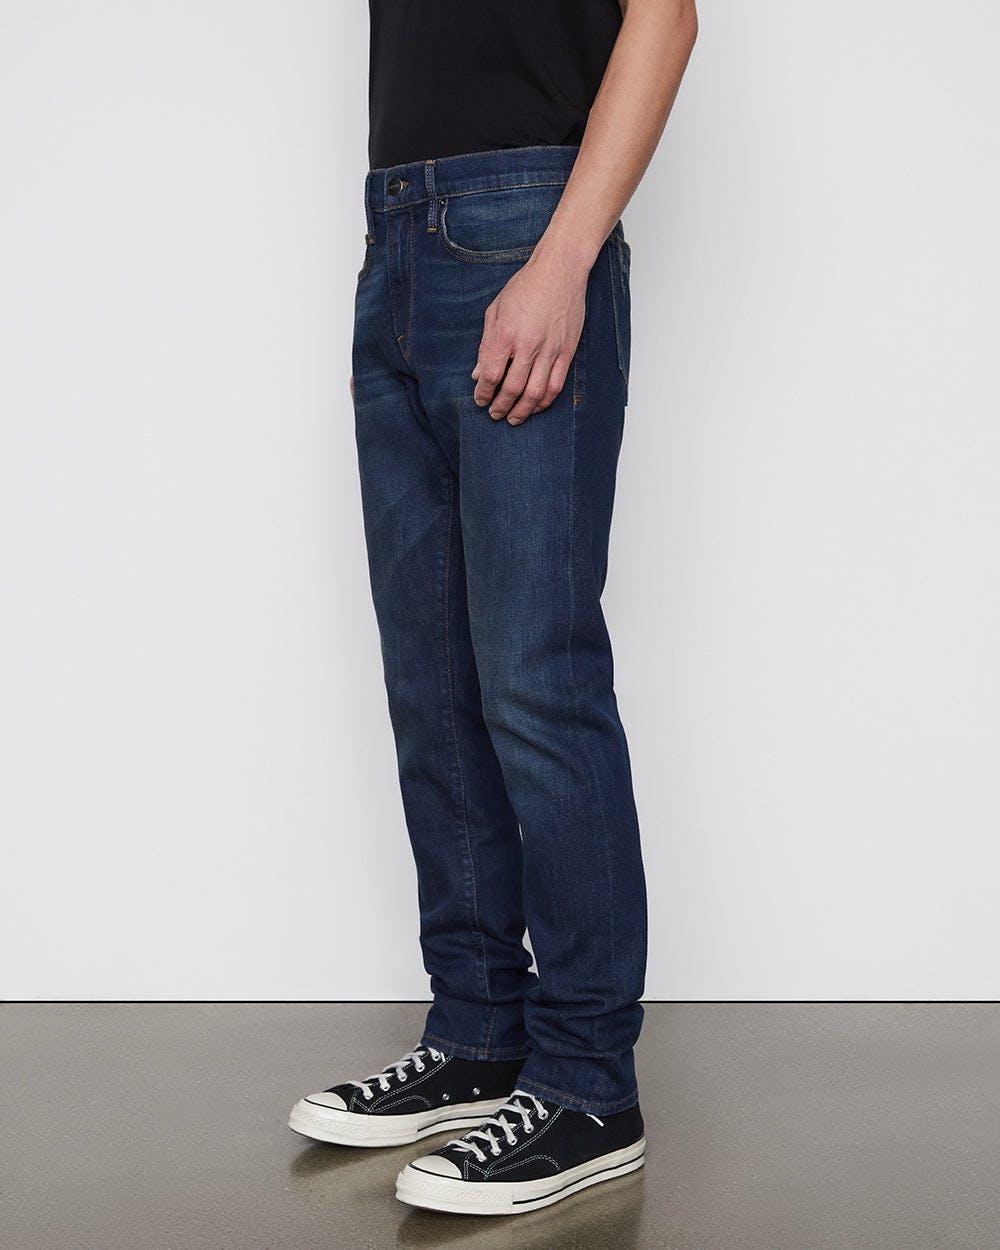 jeans side view alt:hover